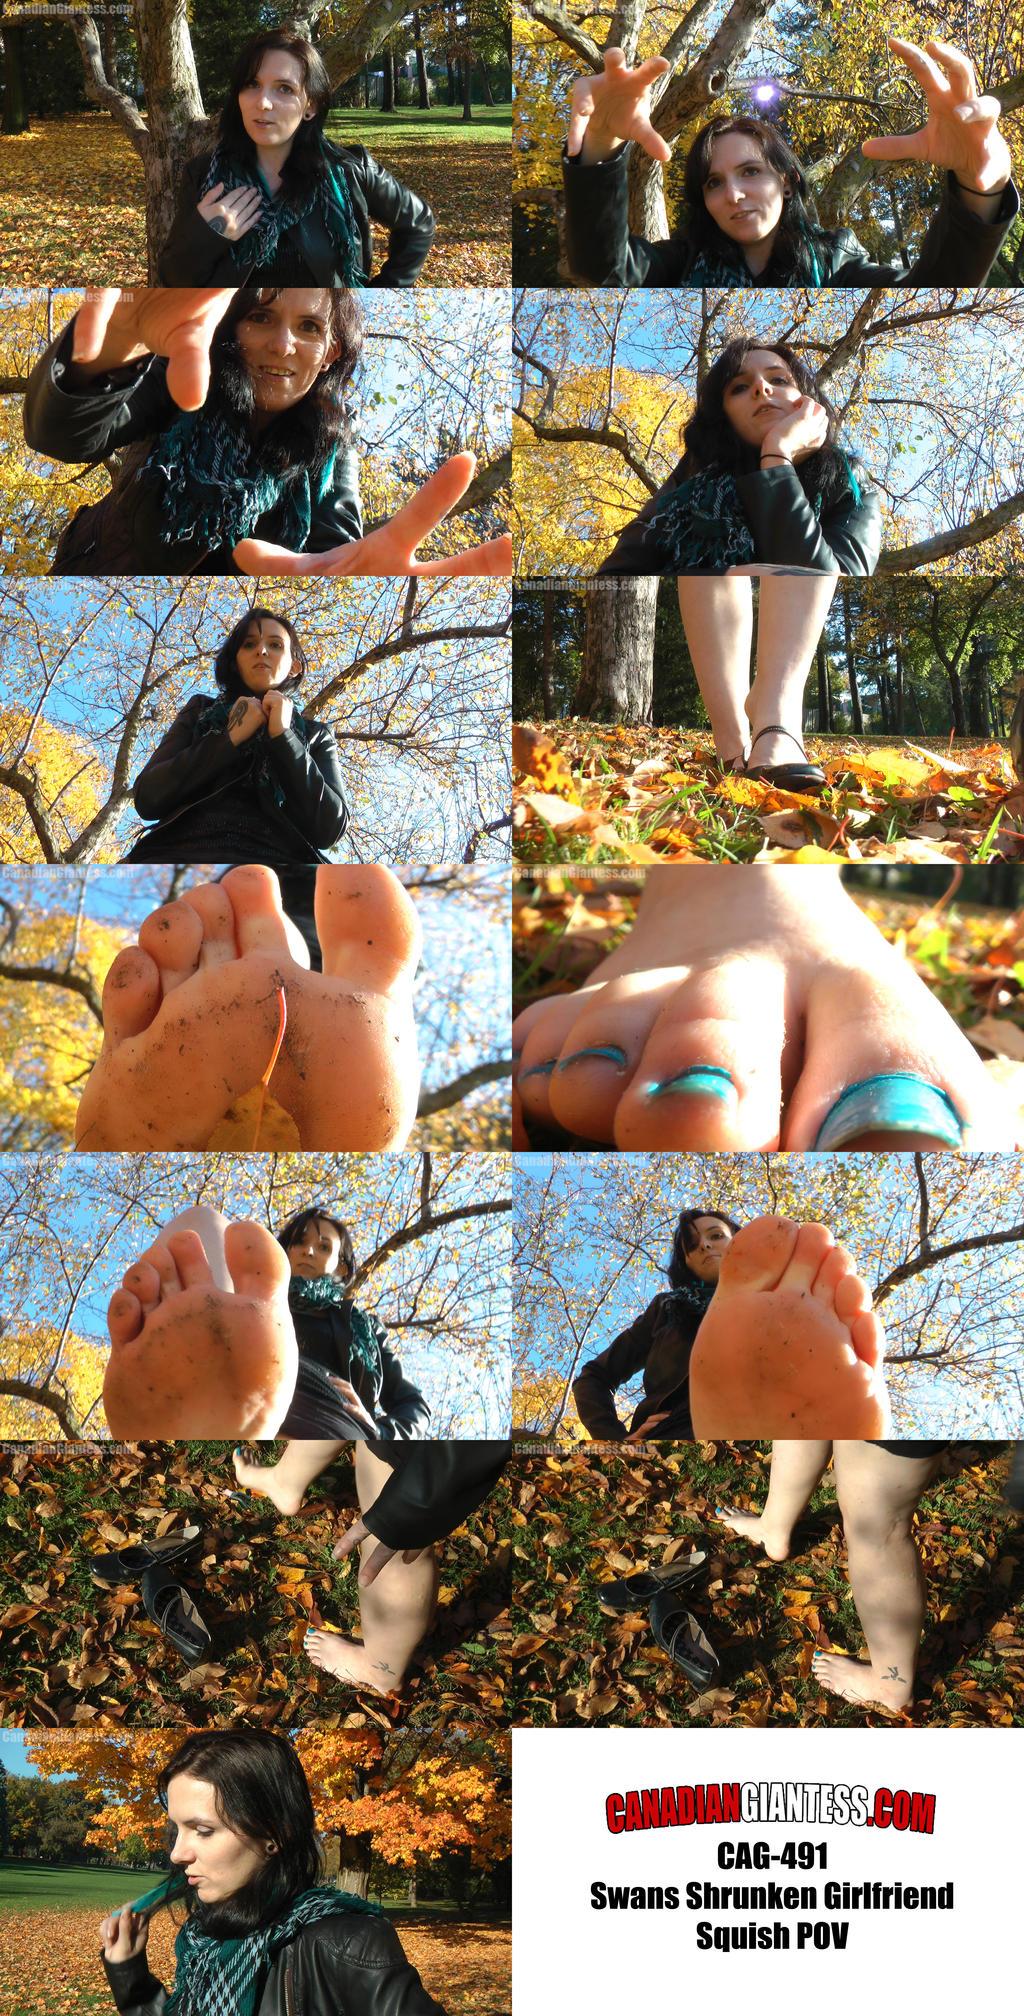 fantasy giantess